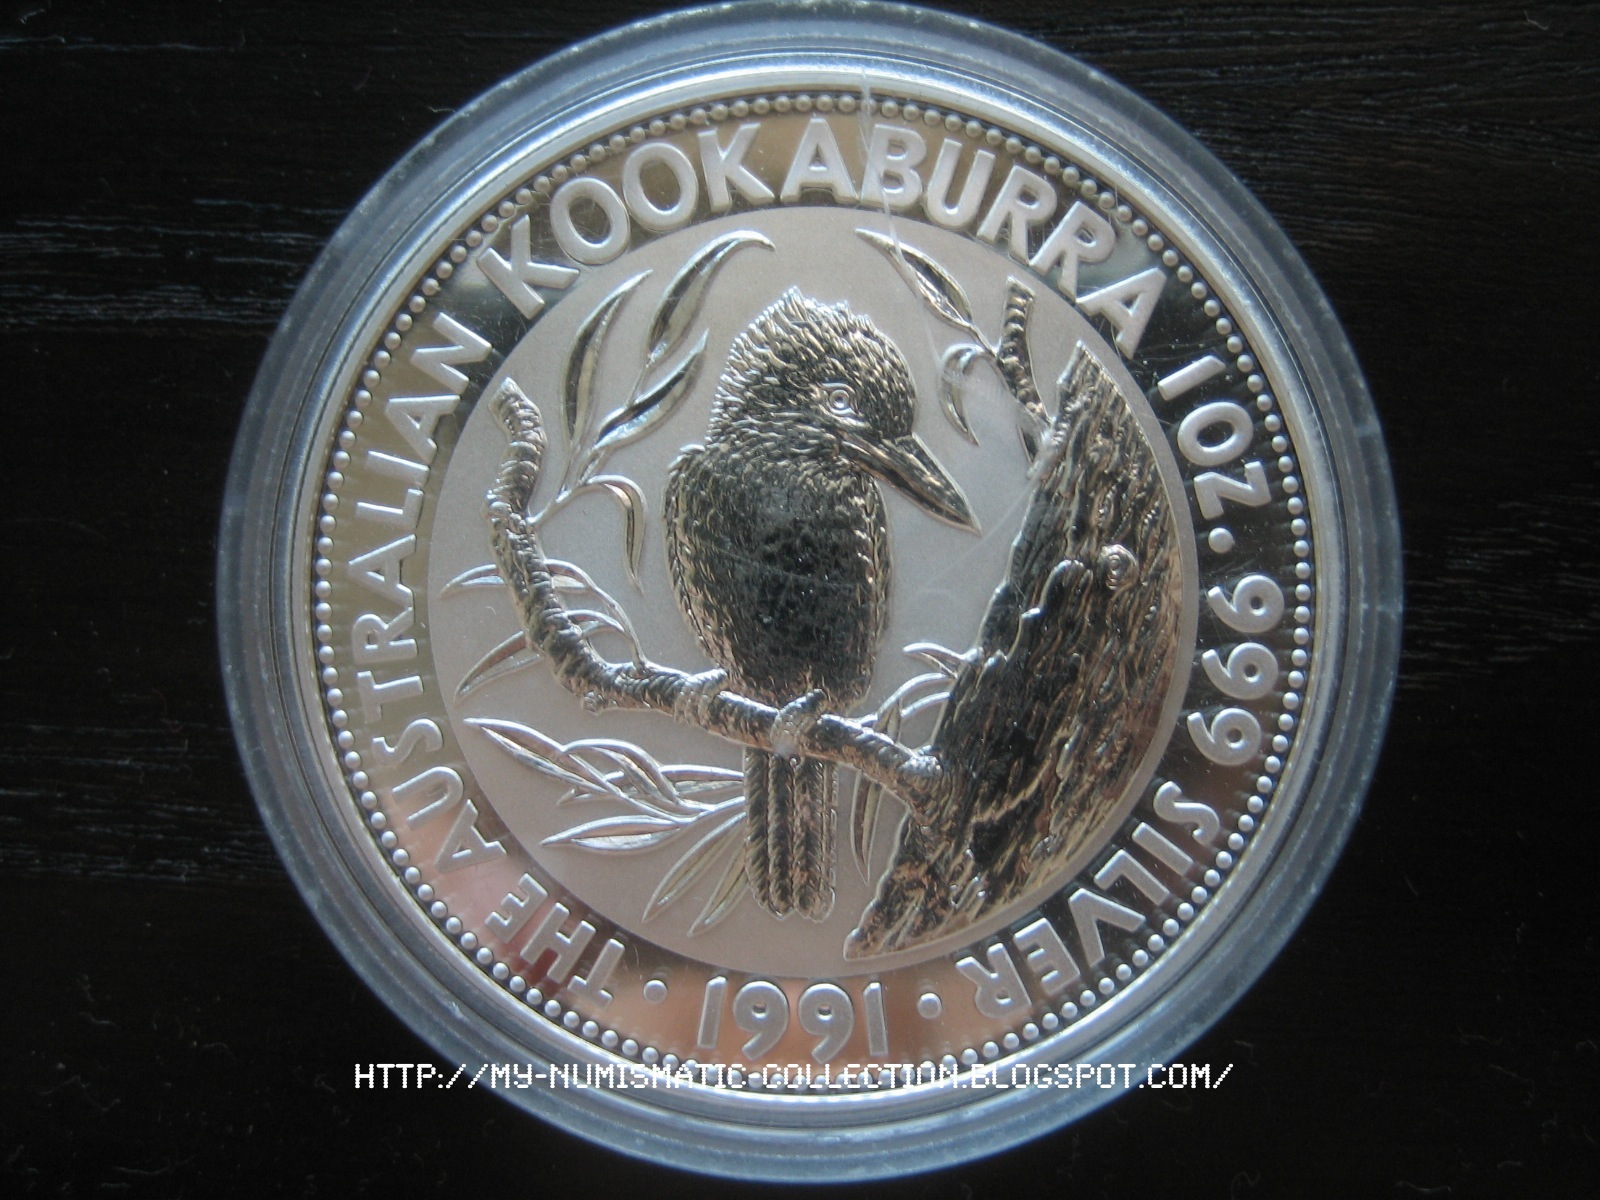 Numismatic Collection 1991 Australian Silver Kookaburra